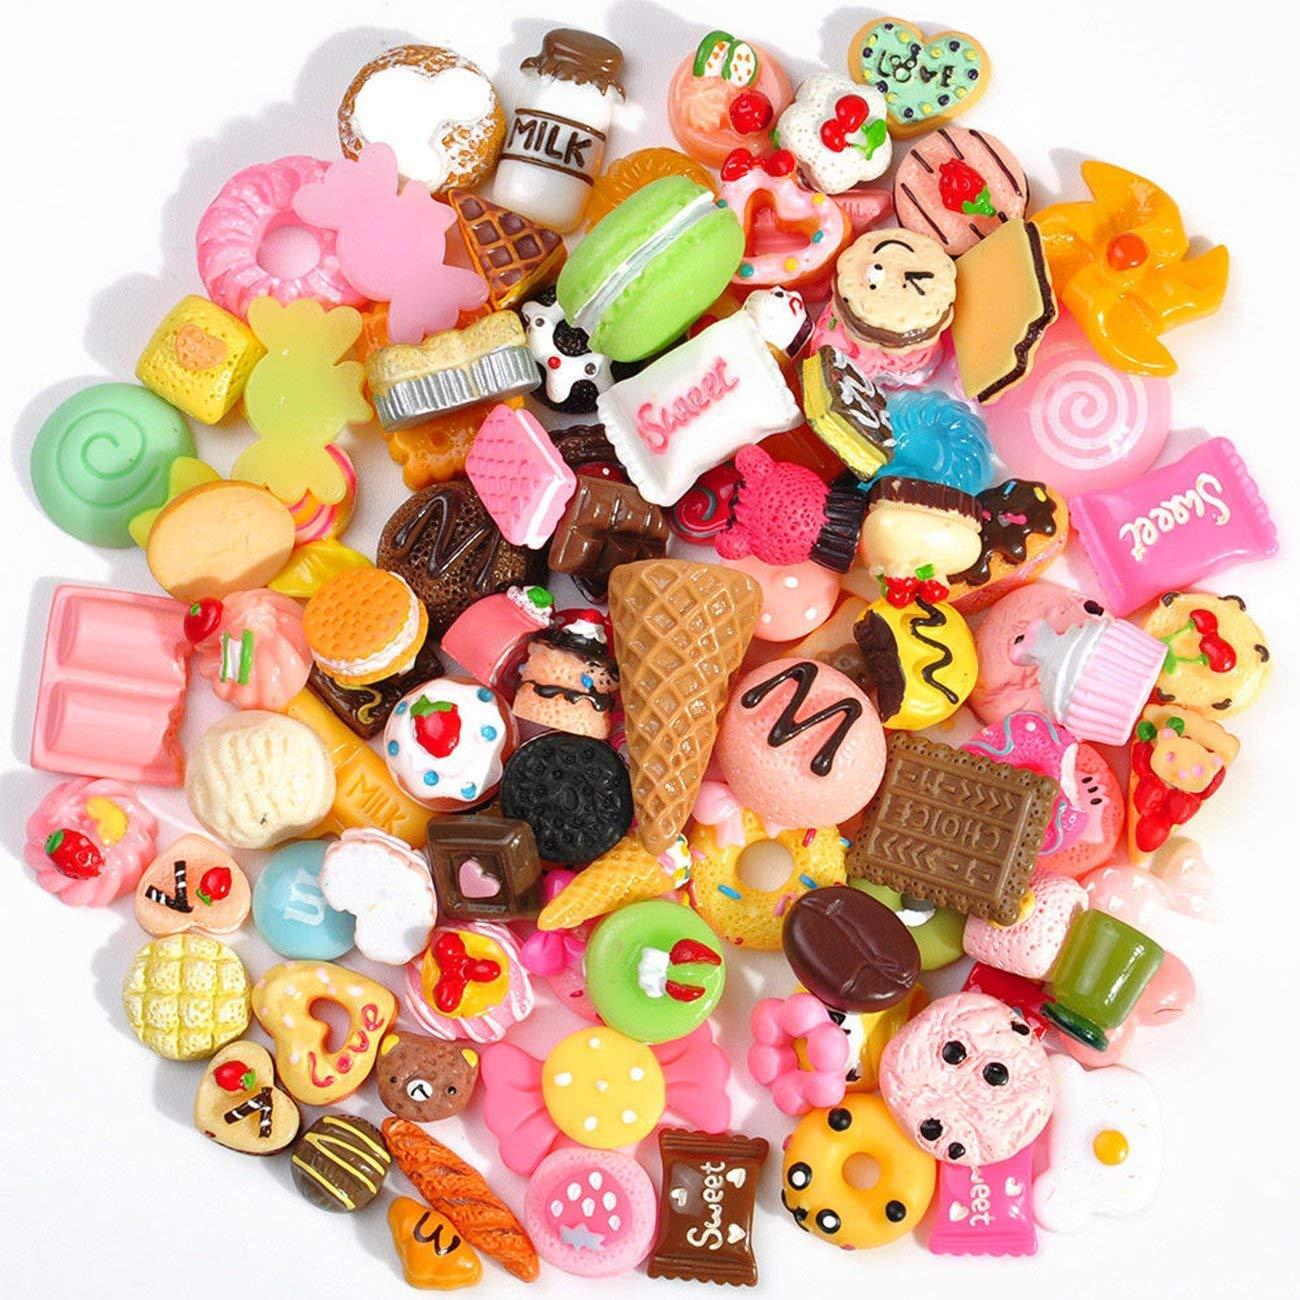 50Pcs Lot Cute Food Candy Scrapbooking Flatback Cabochons DIY Craft Kit Supplies